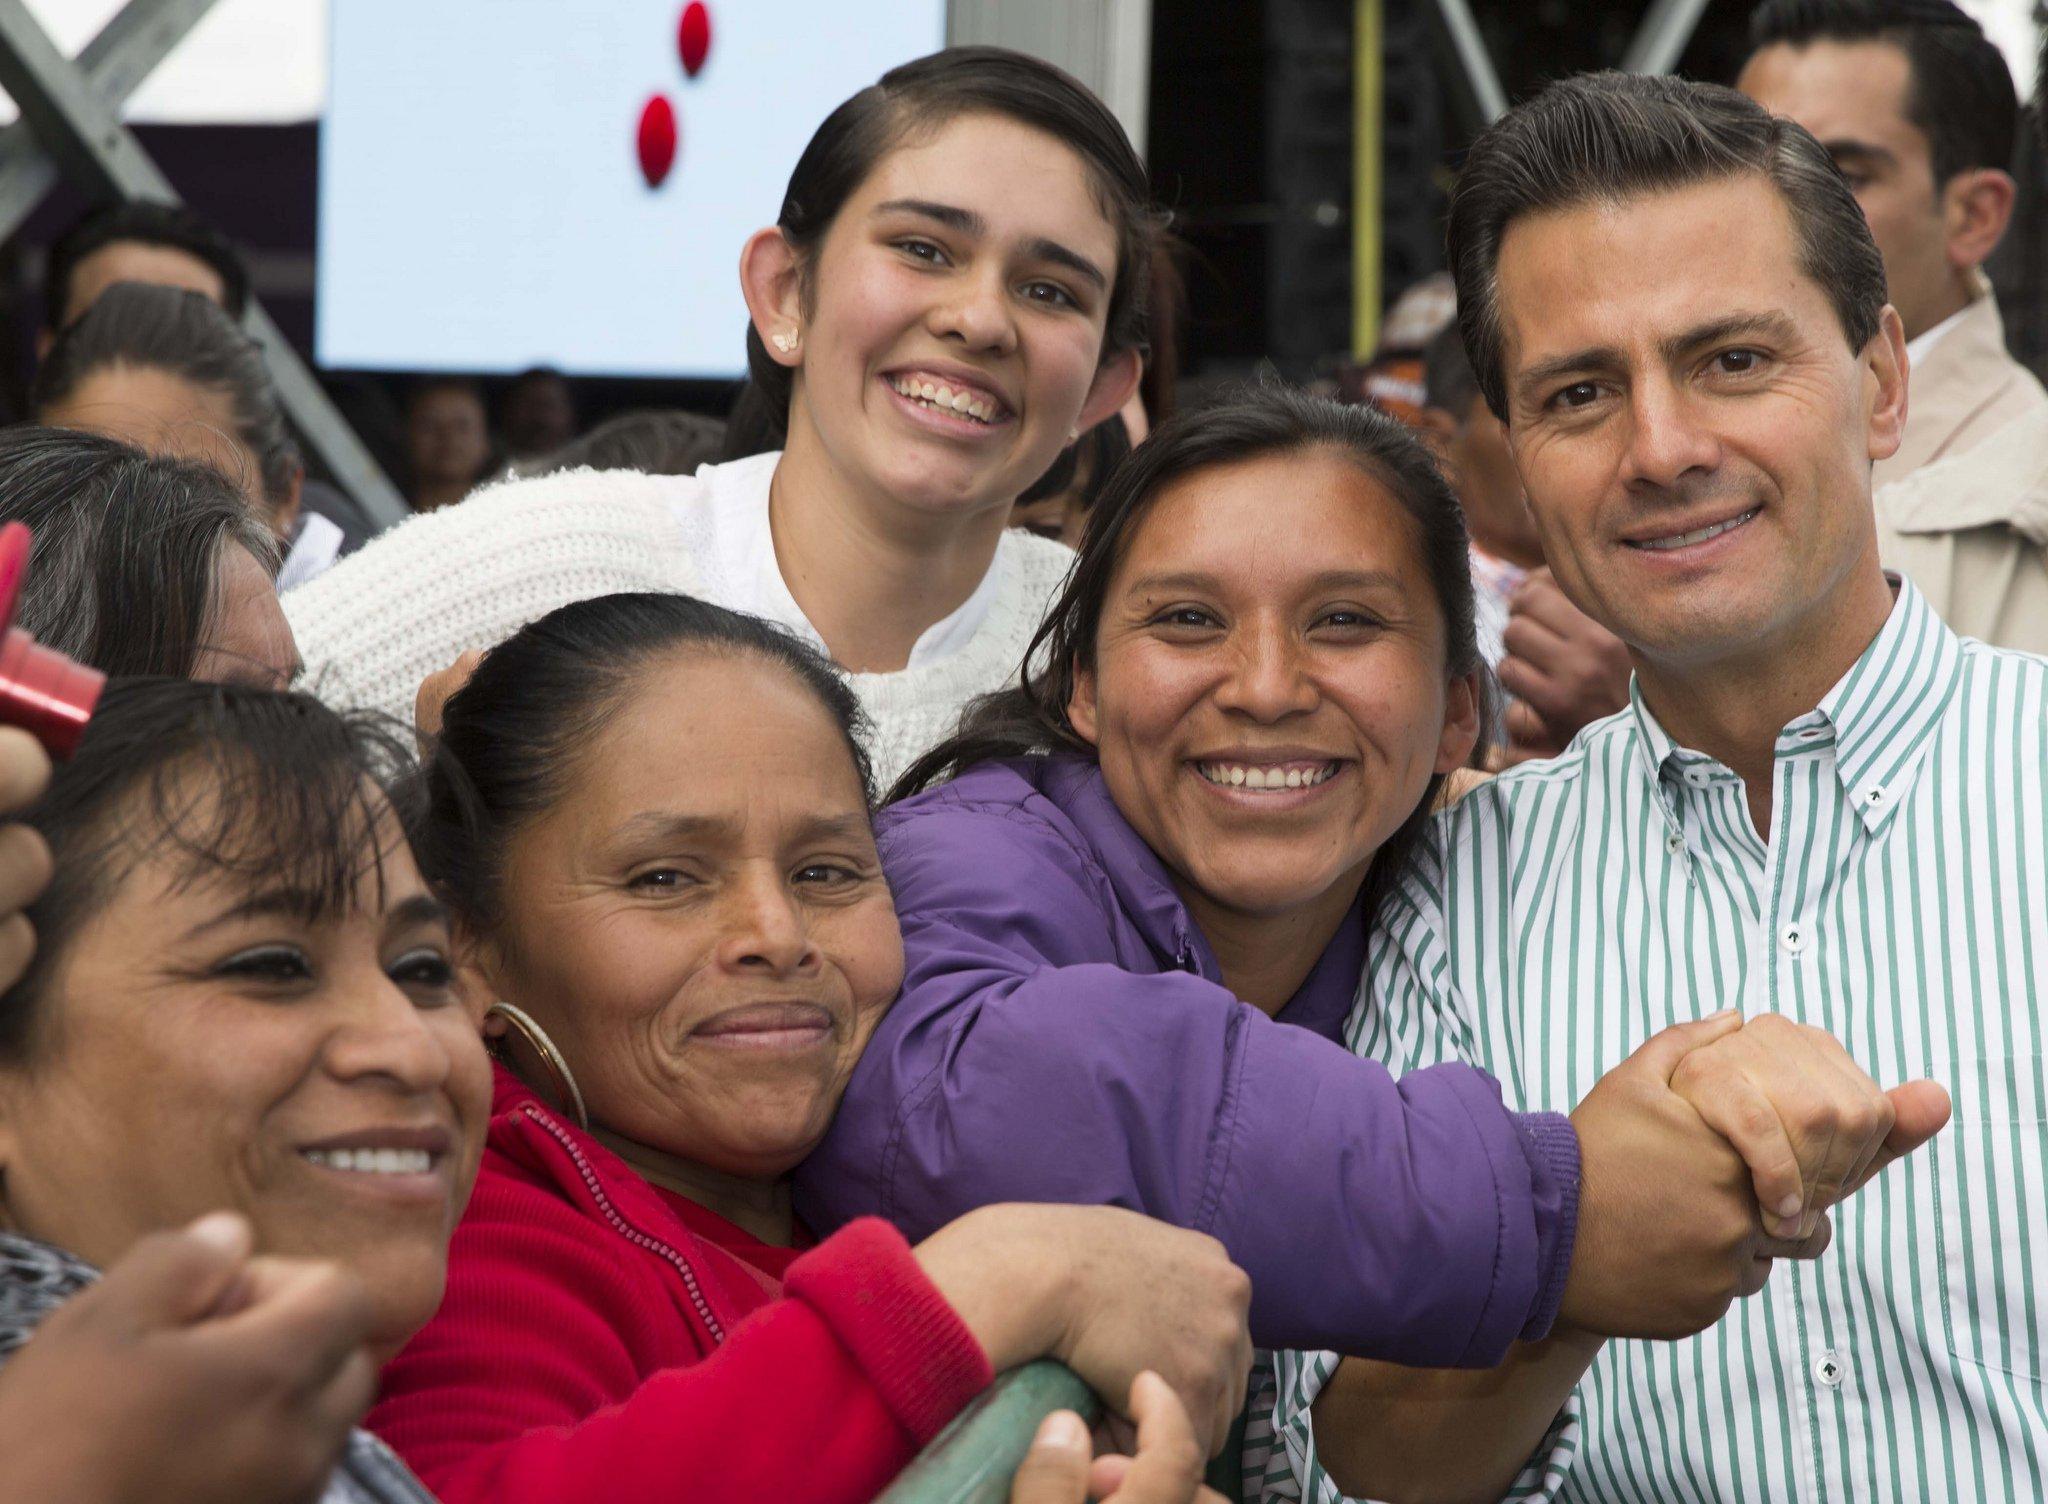 Mexico cash transfer program Prospera; President Enrique Pena Nieto